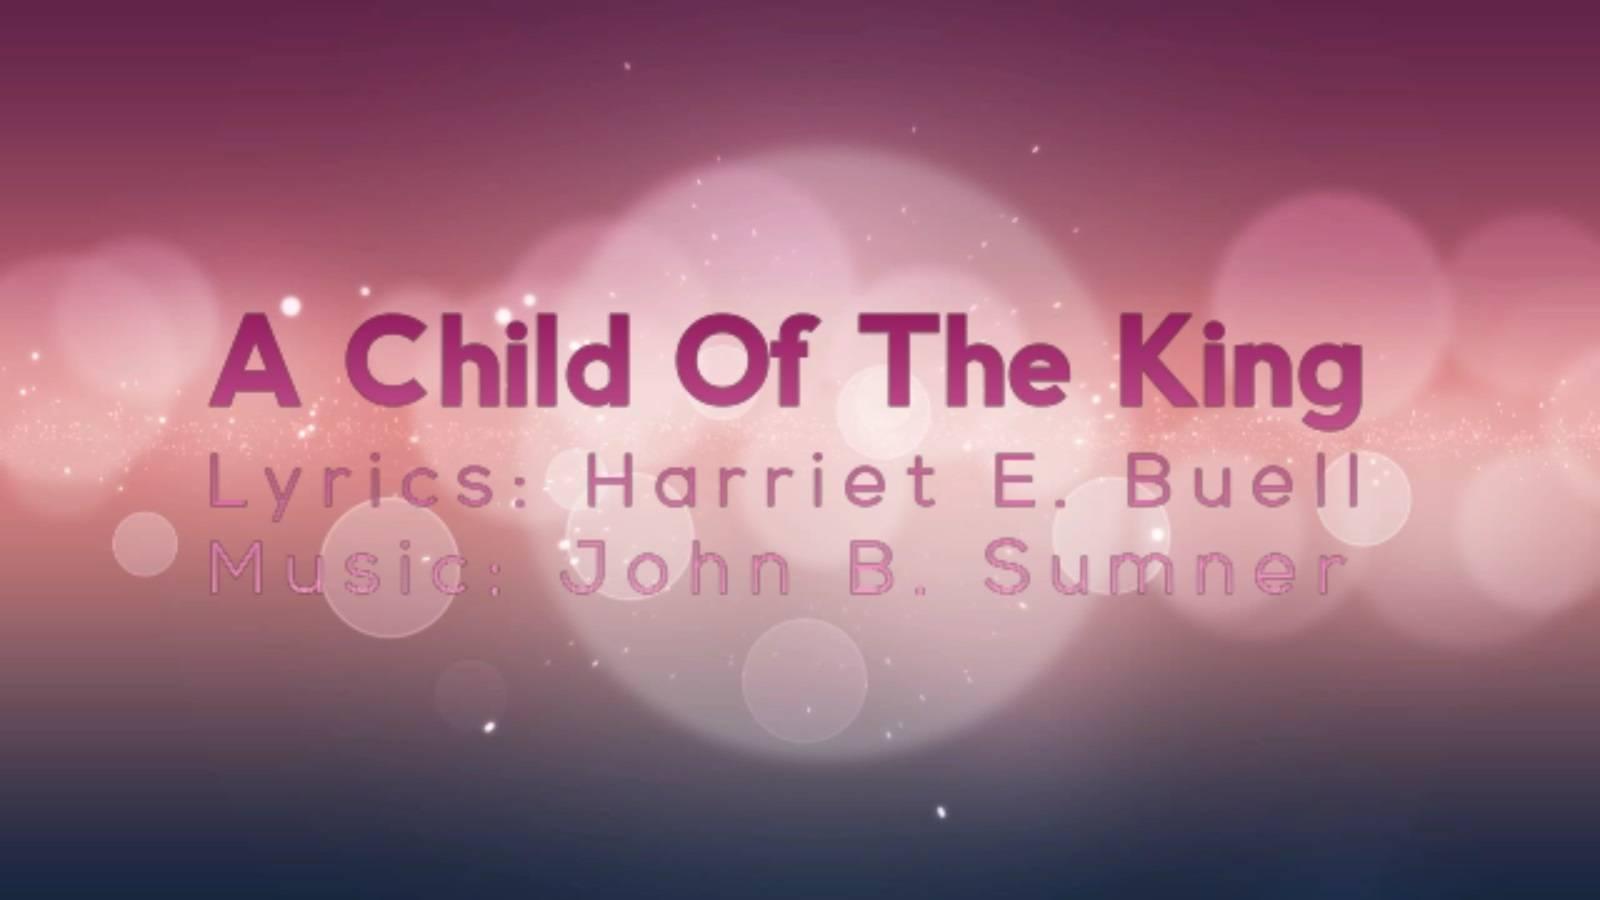 Im a Child of the King With Jesus My Savior with Lyrics